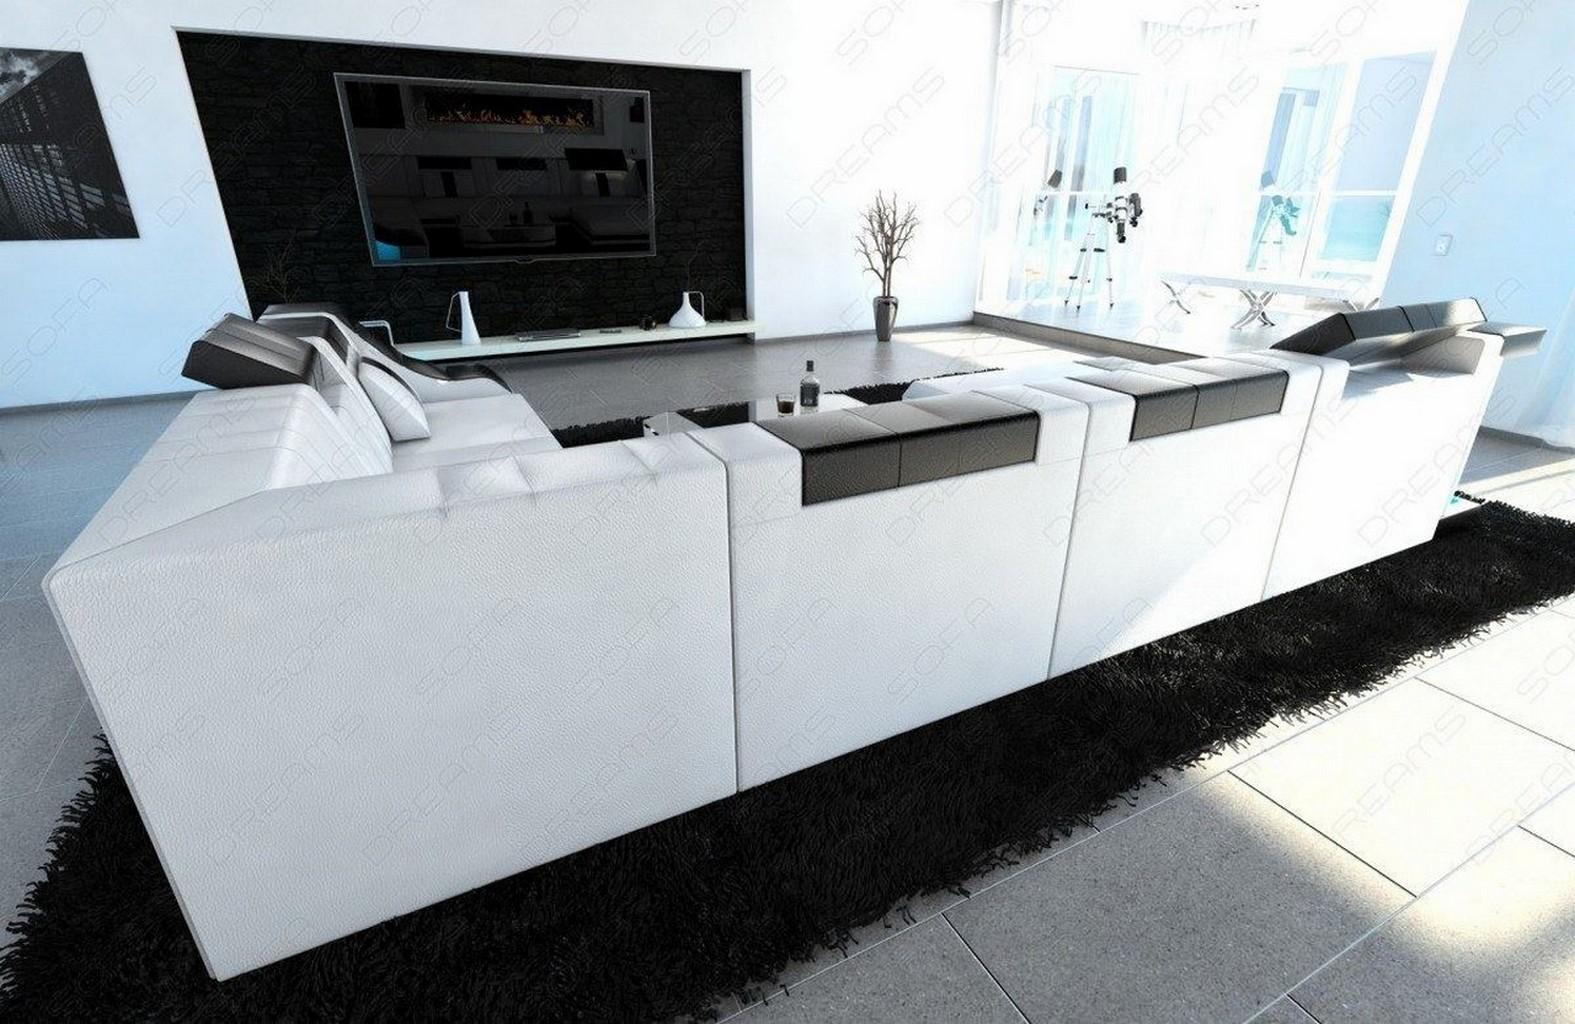 wohnlandschaft leder neuesten design kollektionen f r die familien. Black Bedroom Furniture Sets. Home Design Ideas